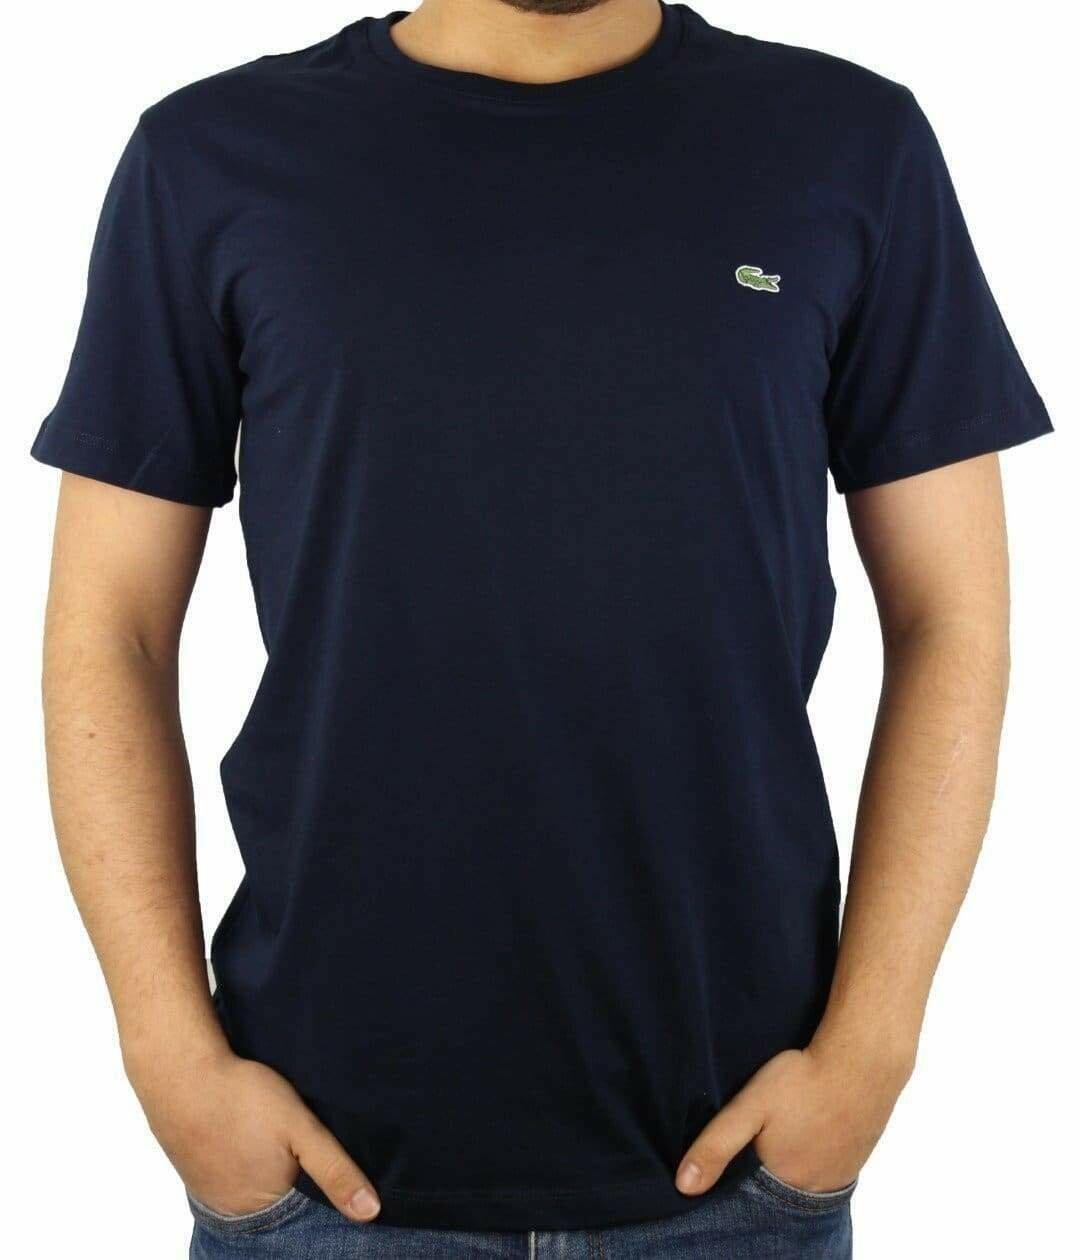 Lacoste Men's T-Shirt  Crew Neck Navy